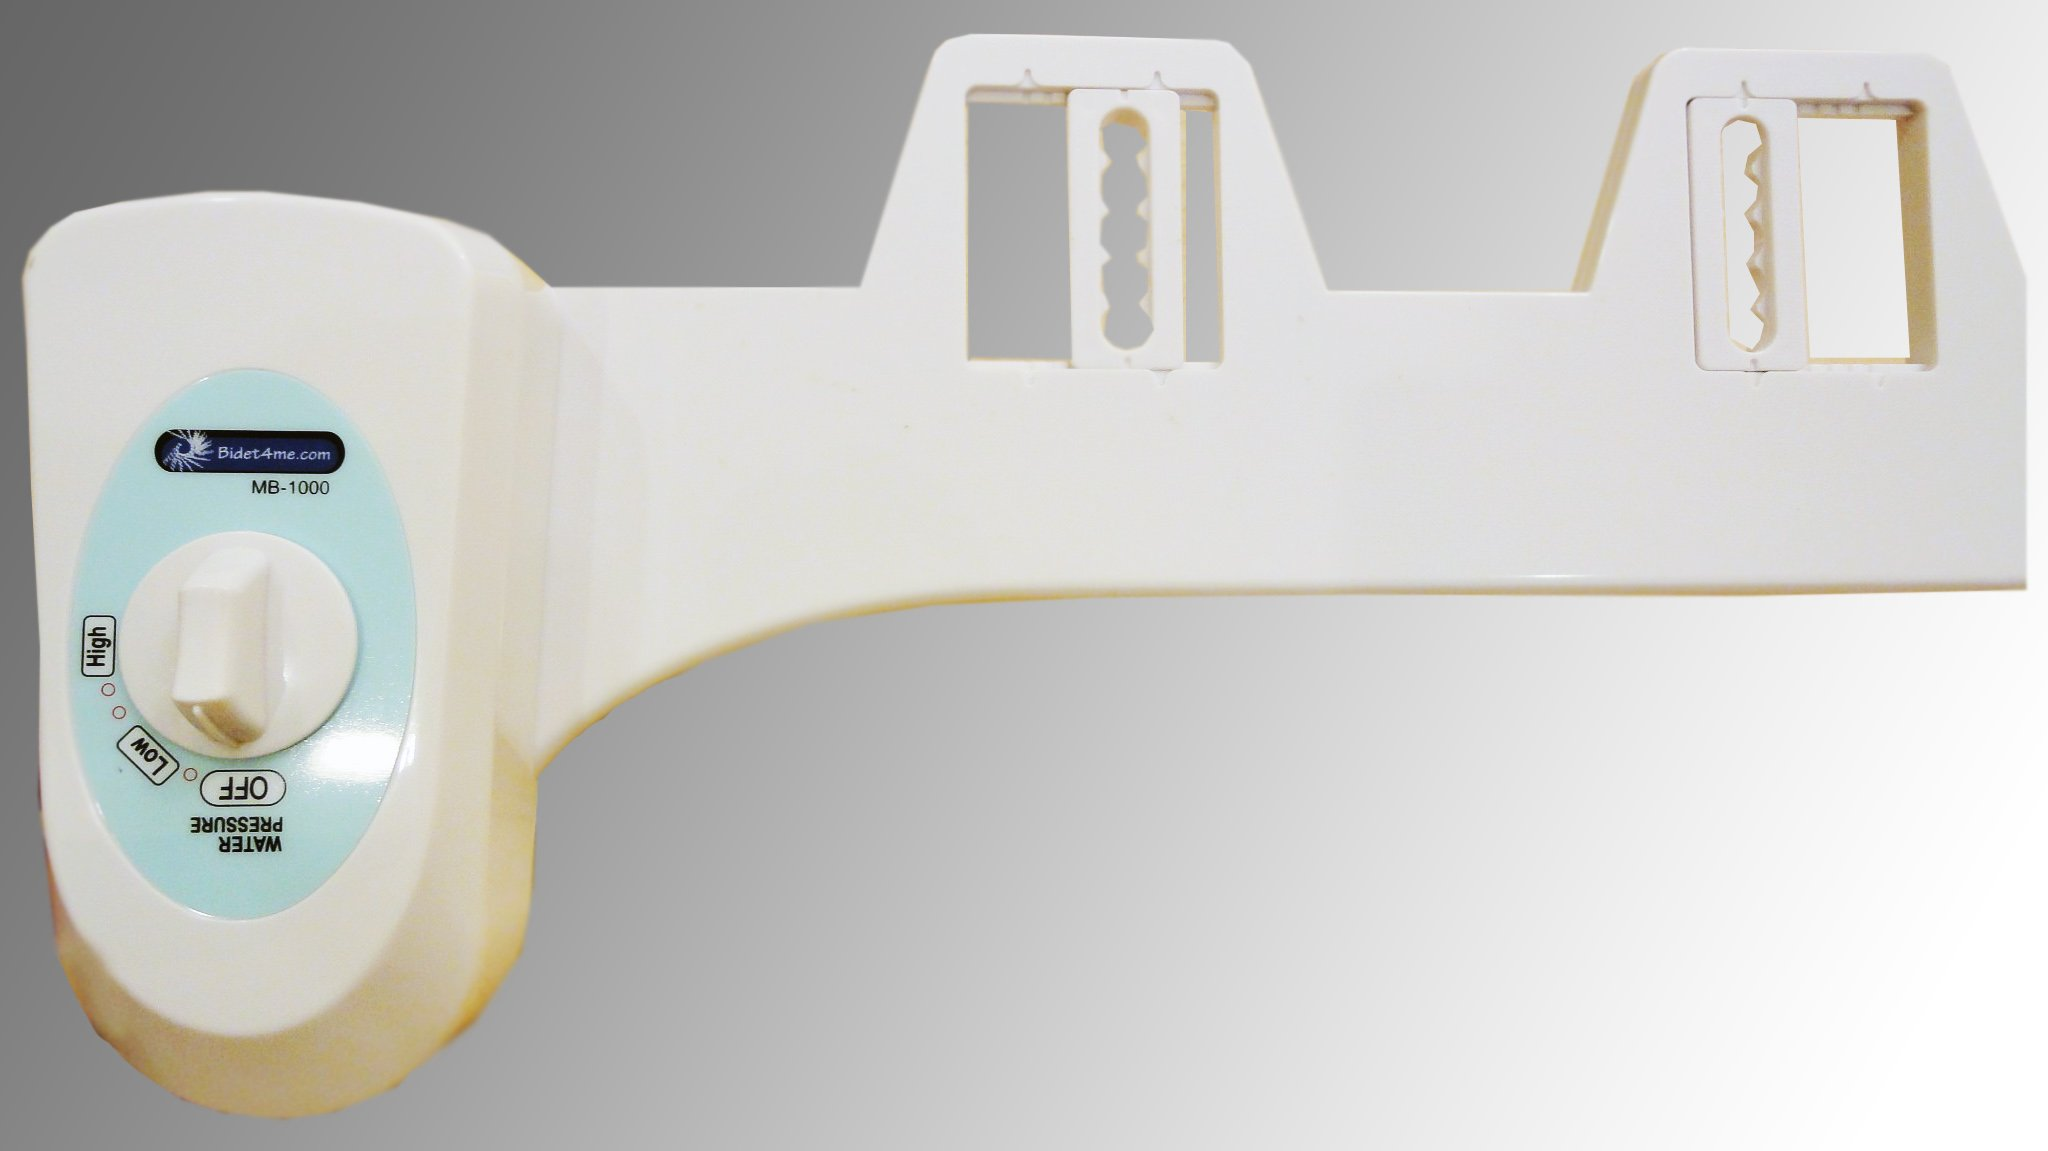 Bidet4me, MB-1000, Fresh Water Spray Non-Electric Mechanical Bidet Toilet Seat Attachment